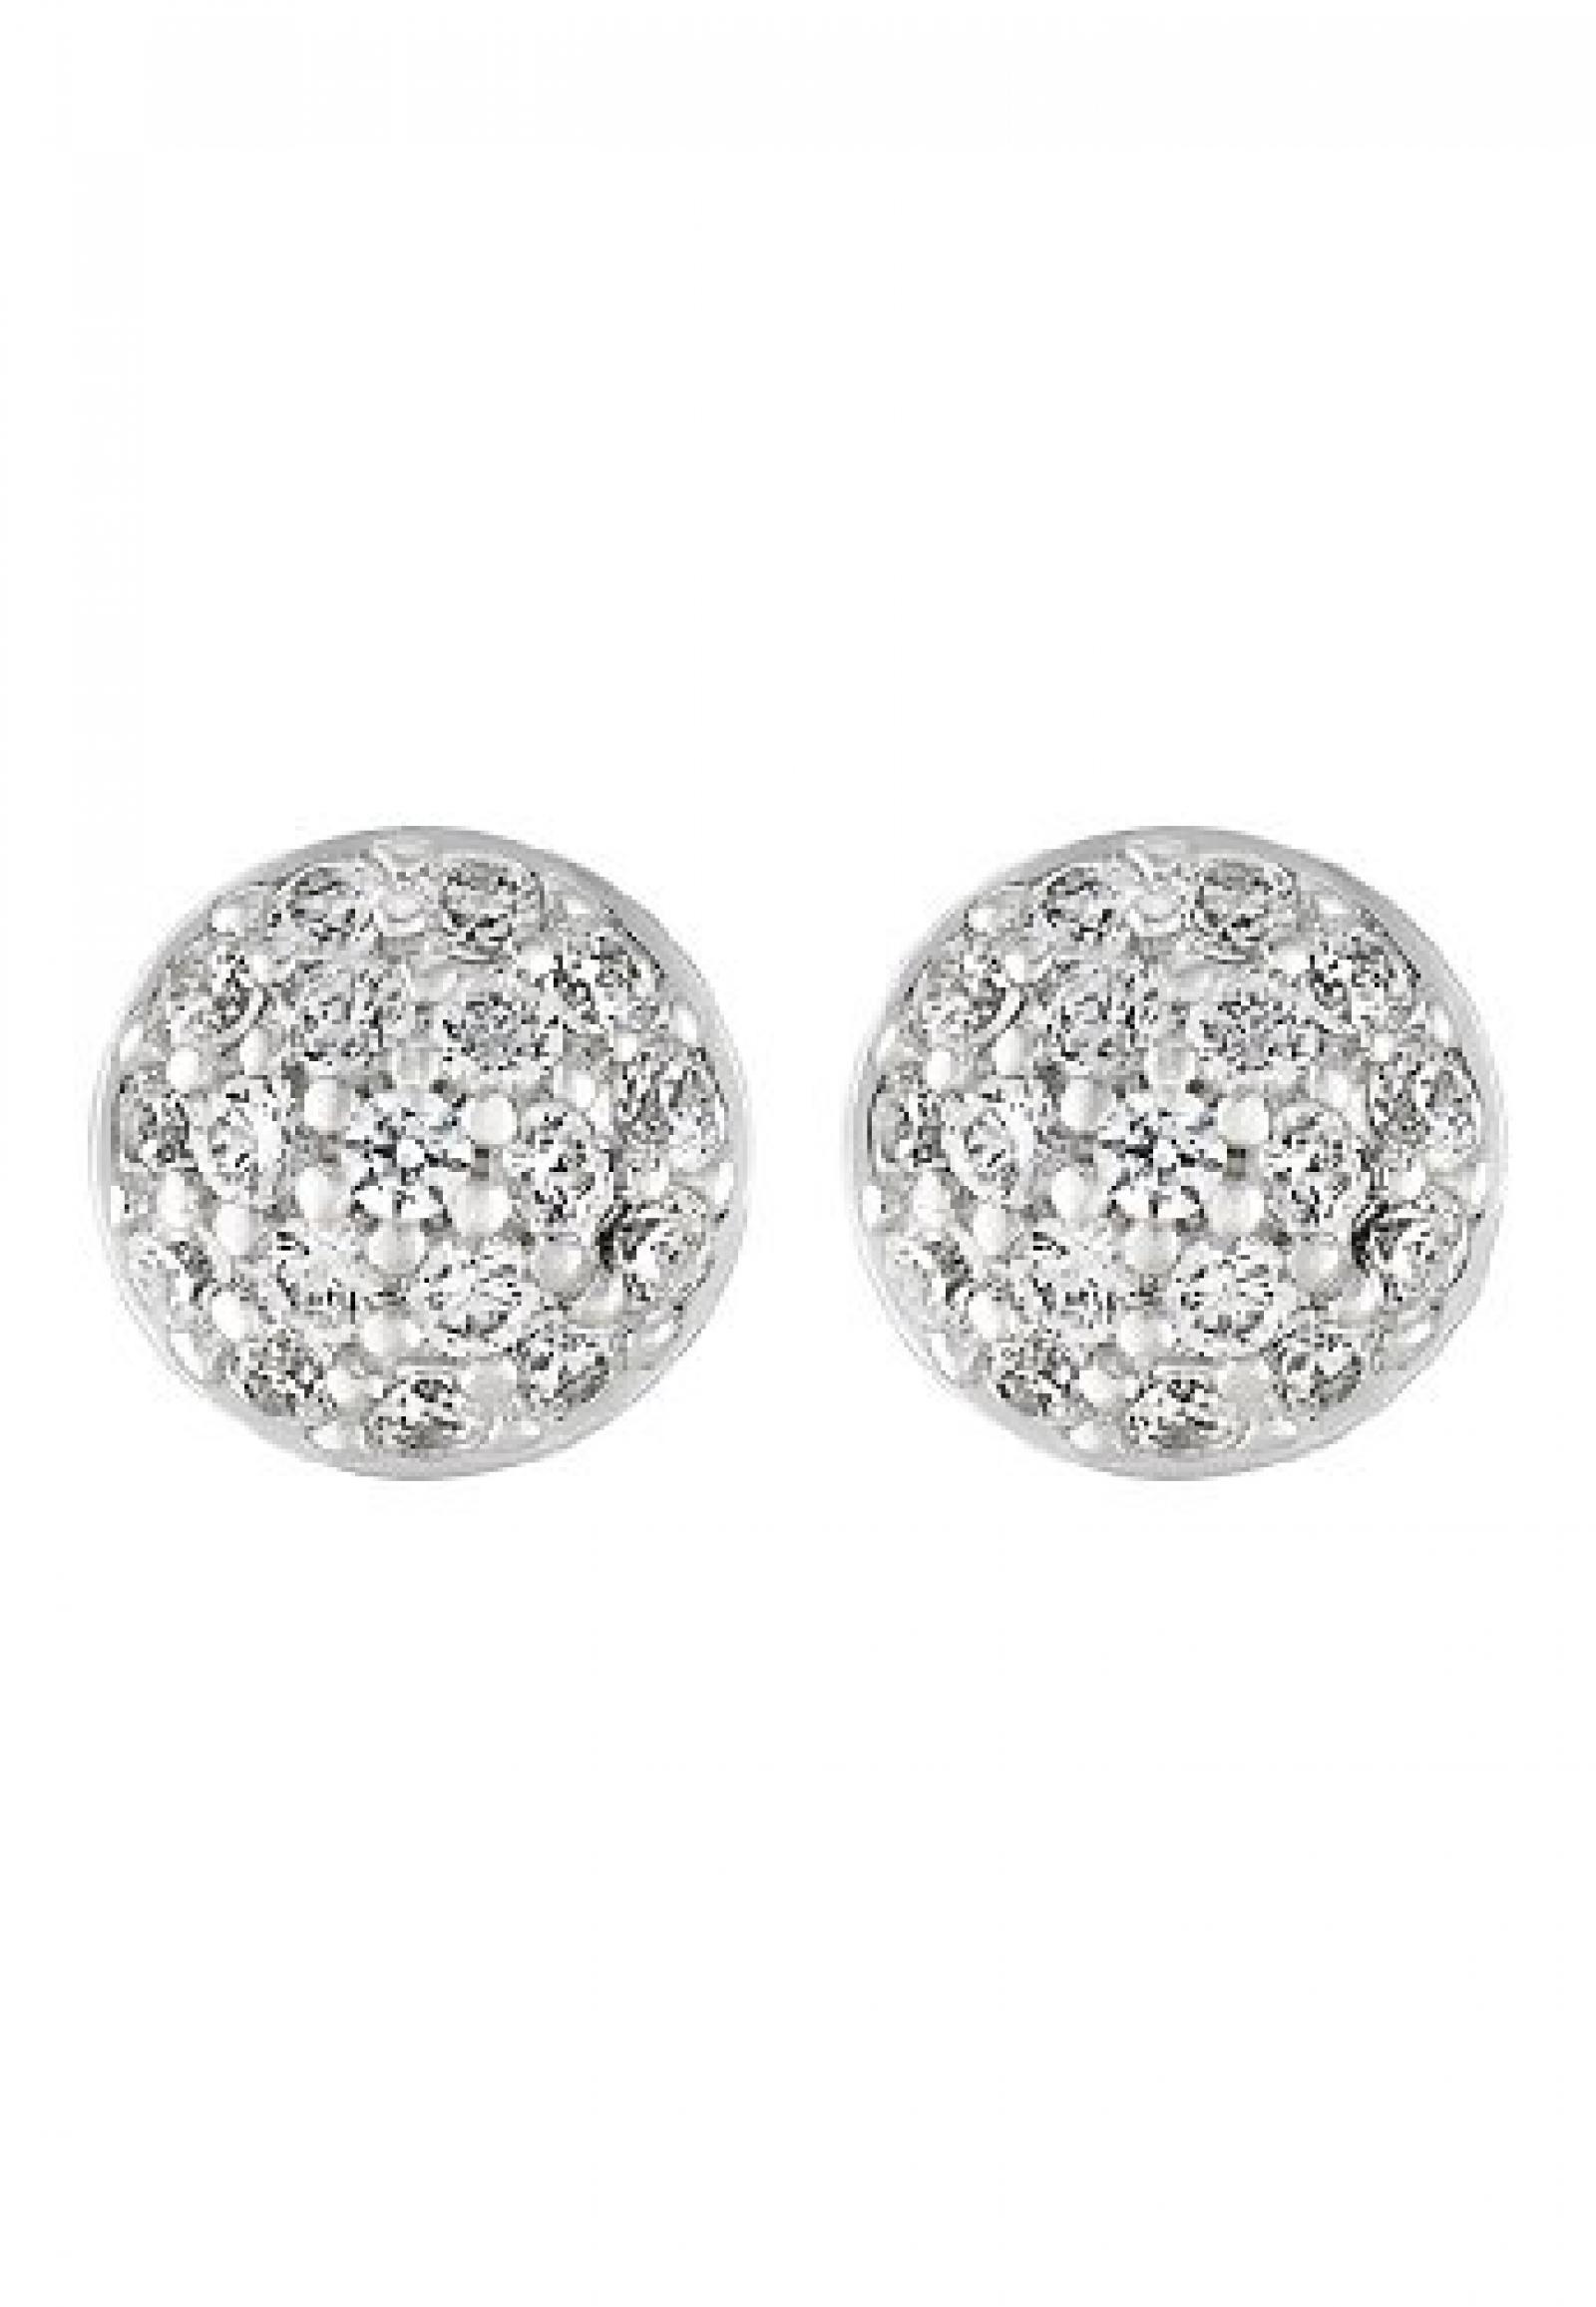 JETTE Silver Damen-Ohrstecker Precious Bowl 925er Silber rhodiniert 36 Zirkonia One Size, silber